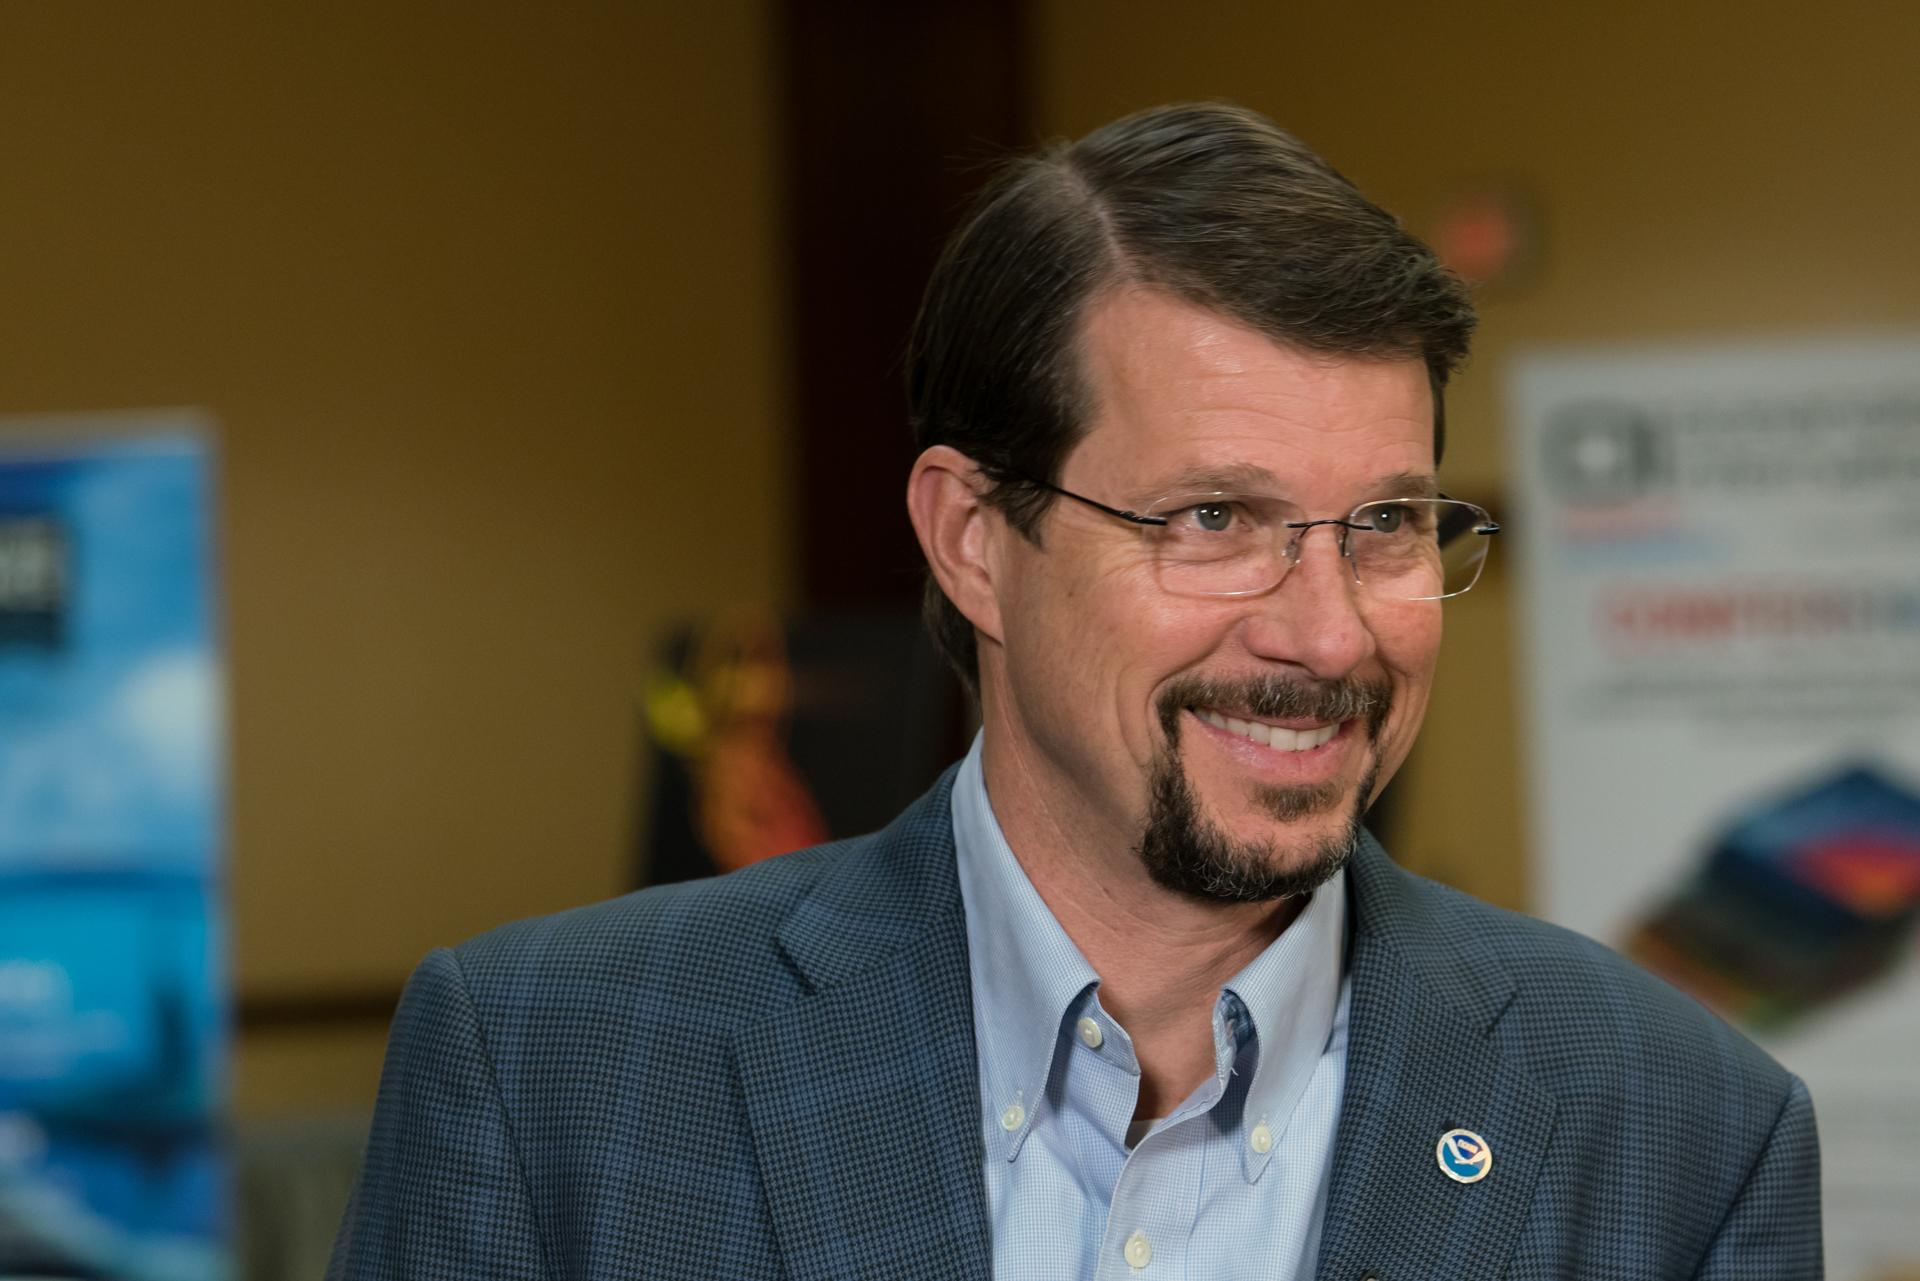 Carl Gouldman  Deputy Director  U.S. Integrated Ocean Observing System (IOOS)